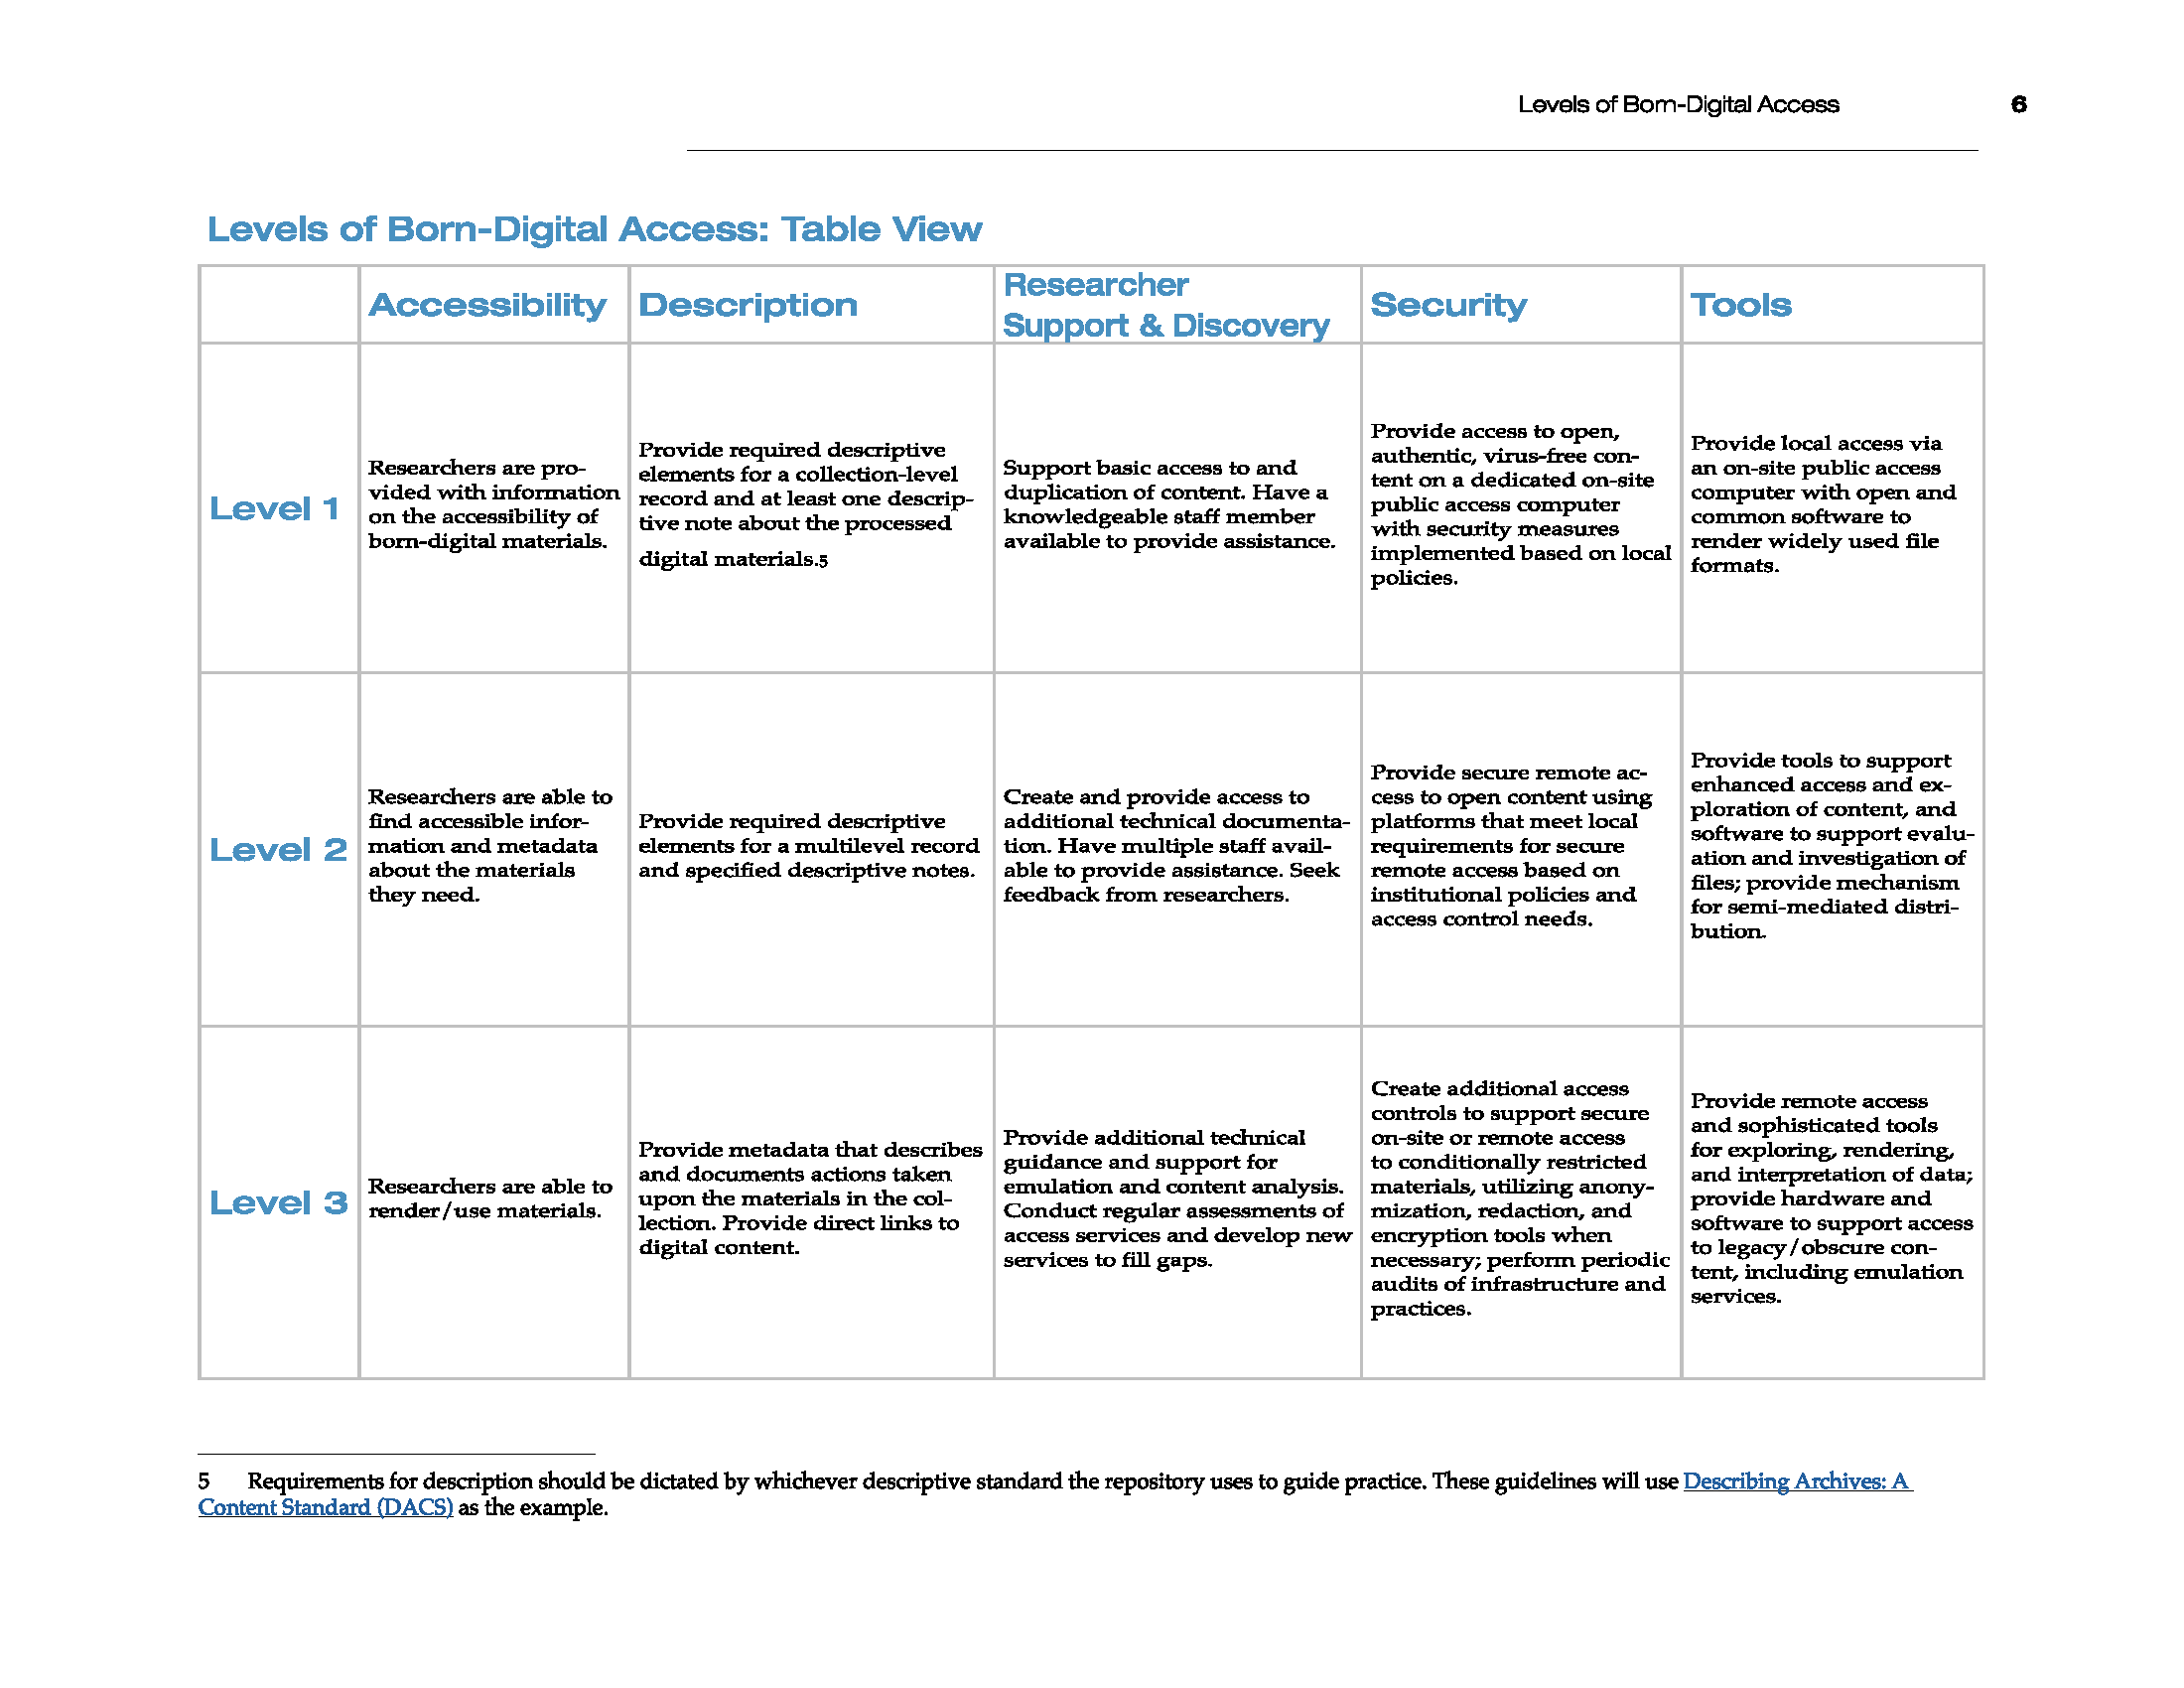 Levels of Born Digital Access Grid Screenshot